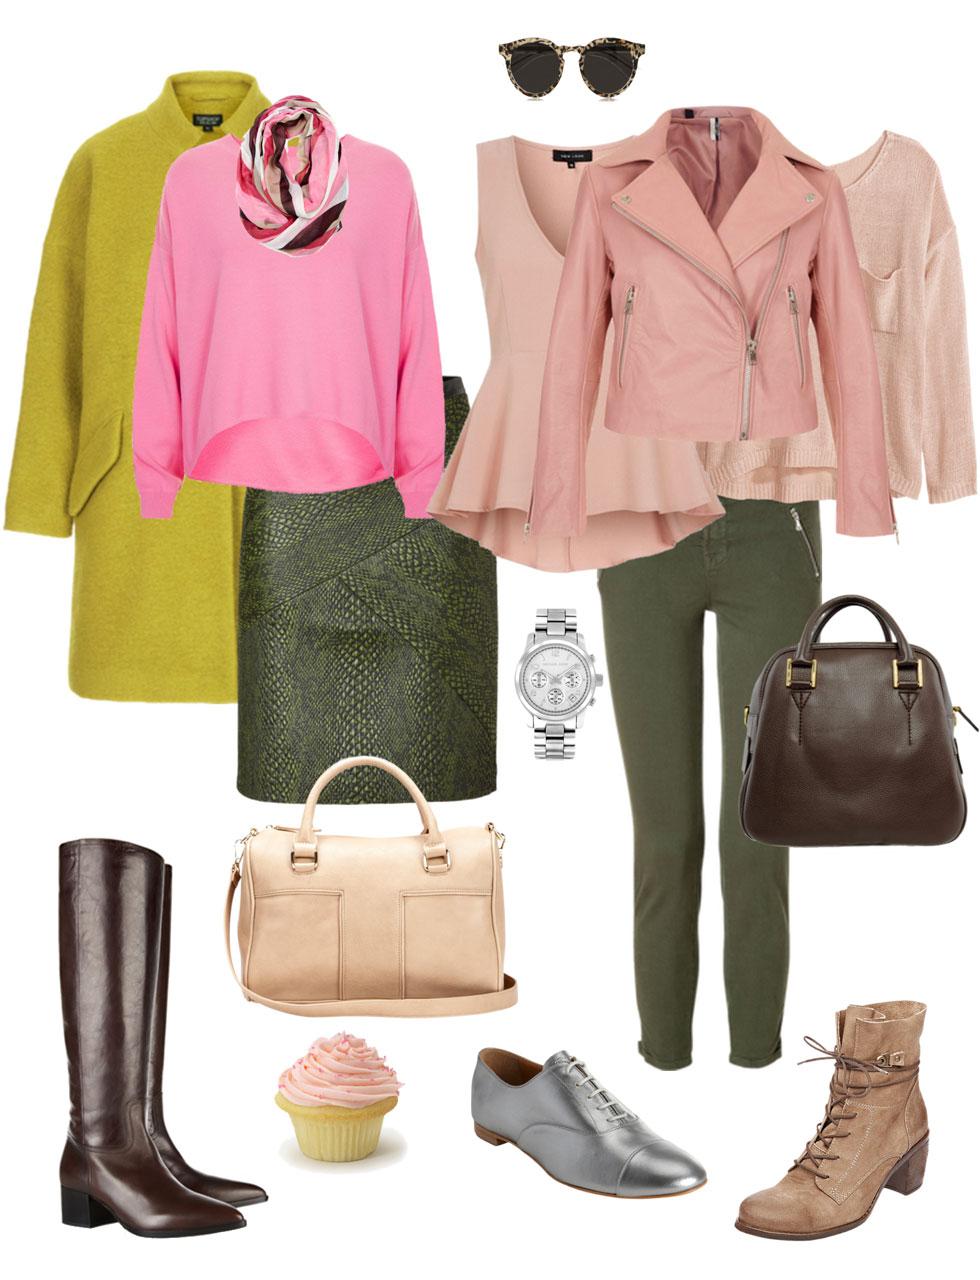 Ensemble: Olive & Pink